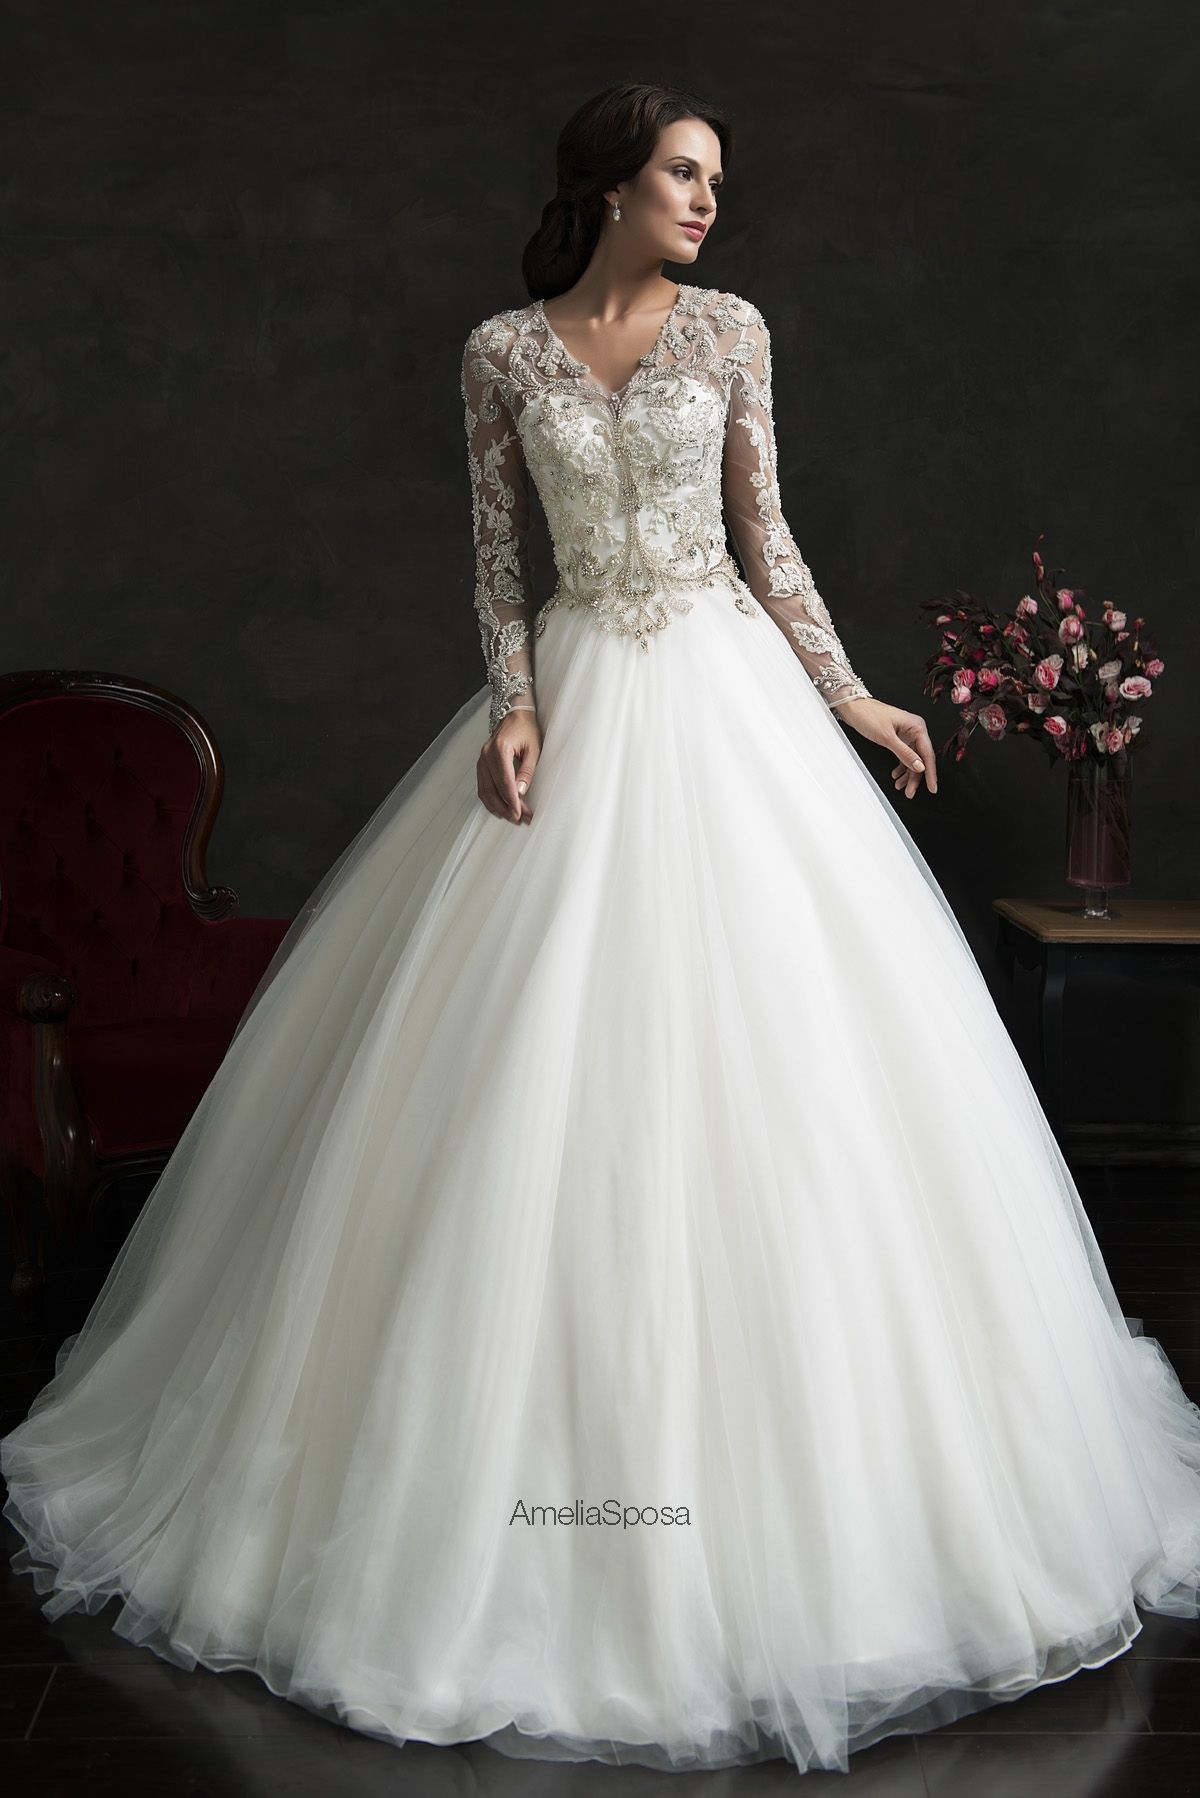 Amelia Sposa 2015 wedding dress gorgeous ness! Embellished wedding dress #ball gown #love by Amelia Sposa   heartoverheels.com